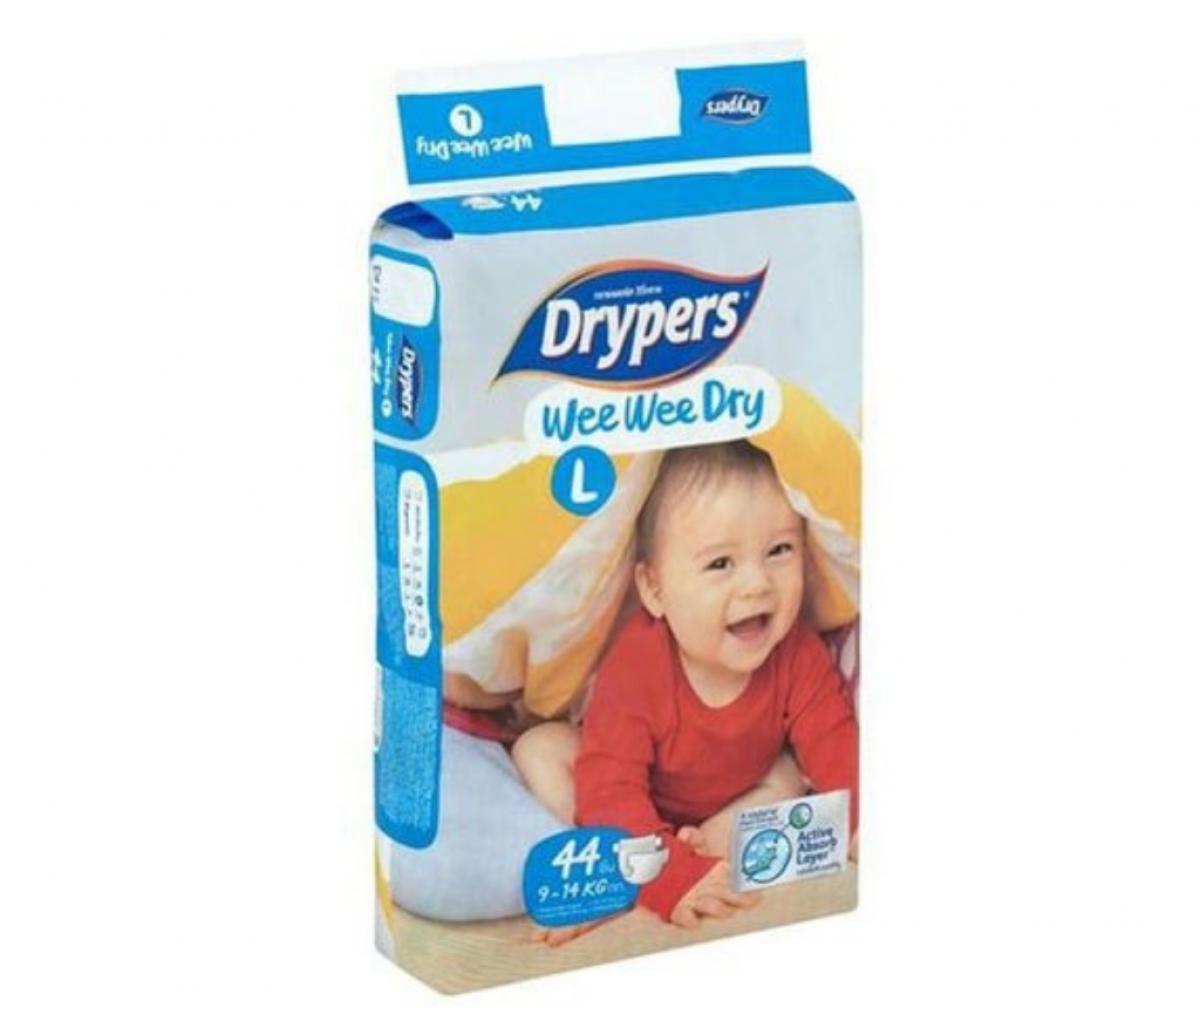 Drypers Baby Diaper (L)